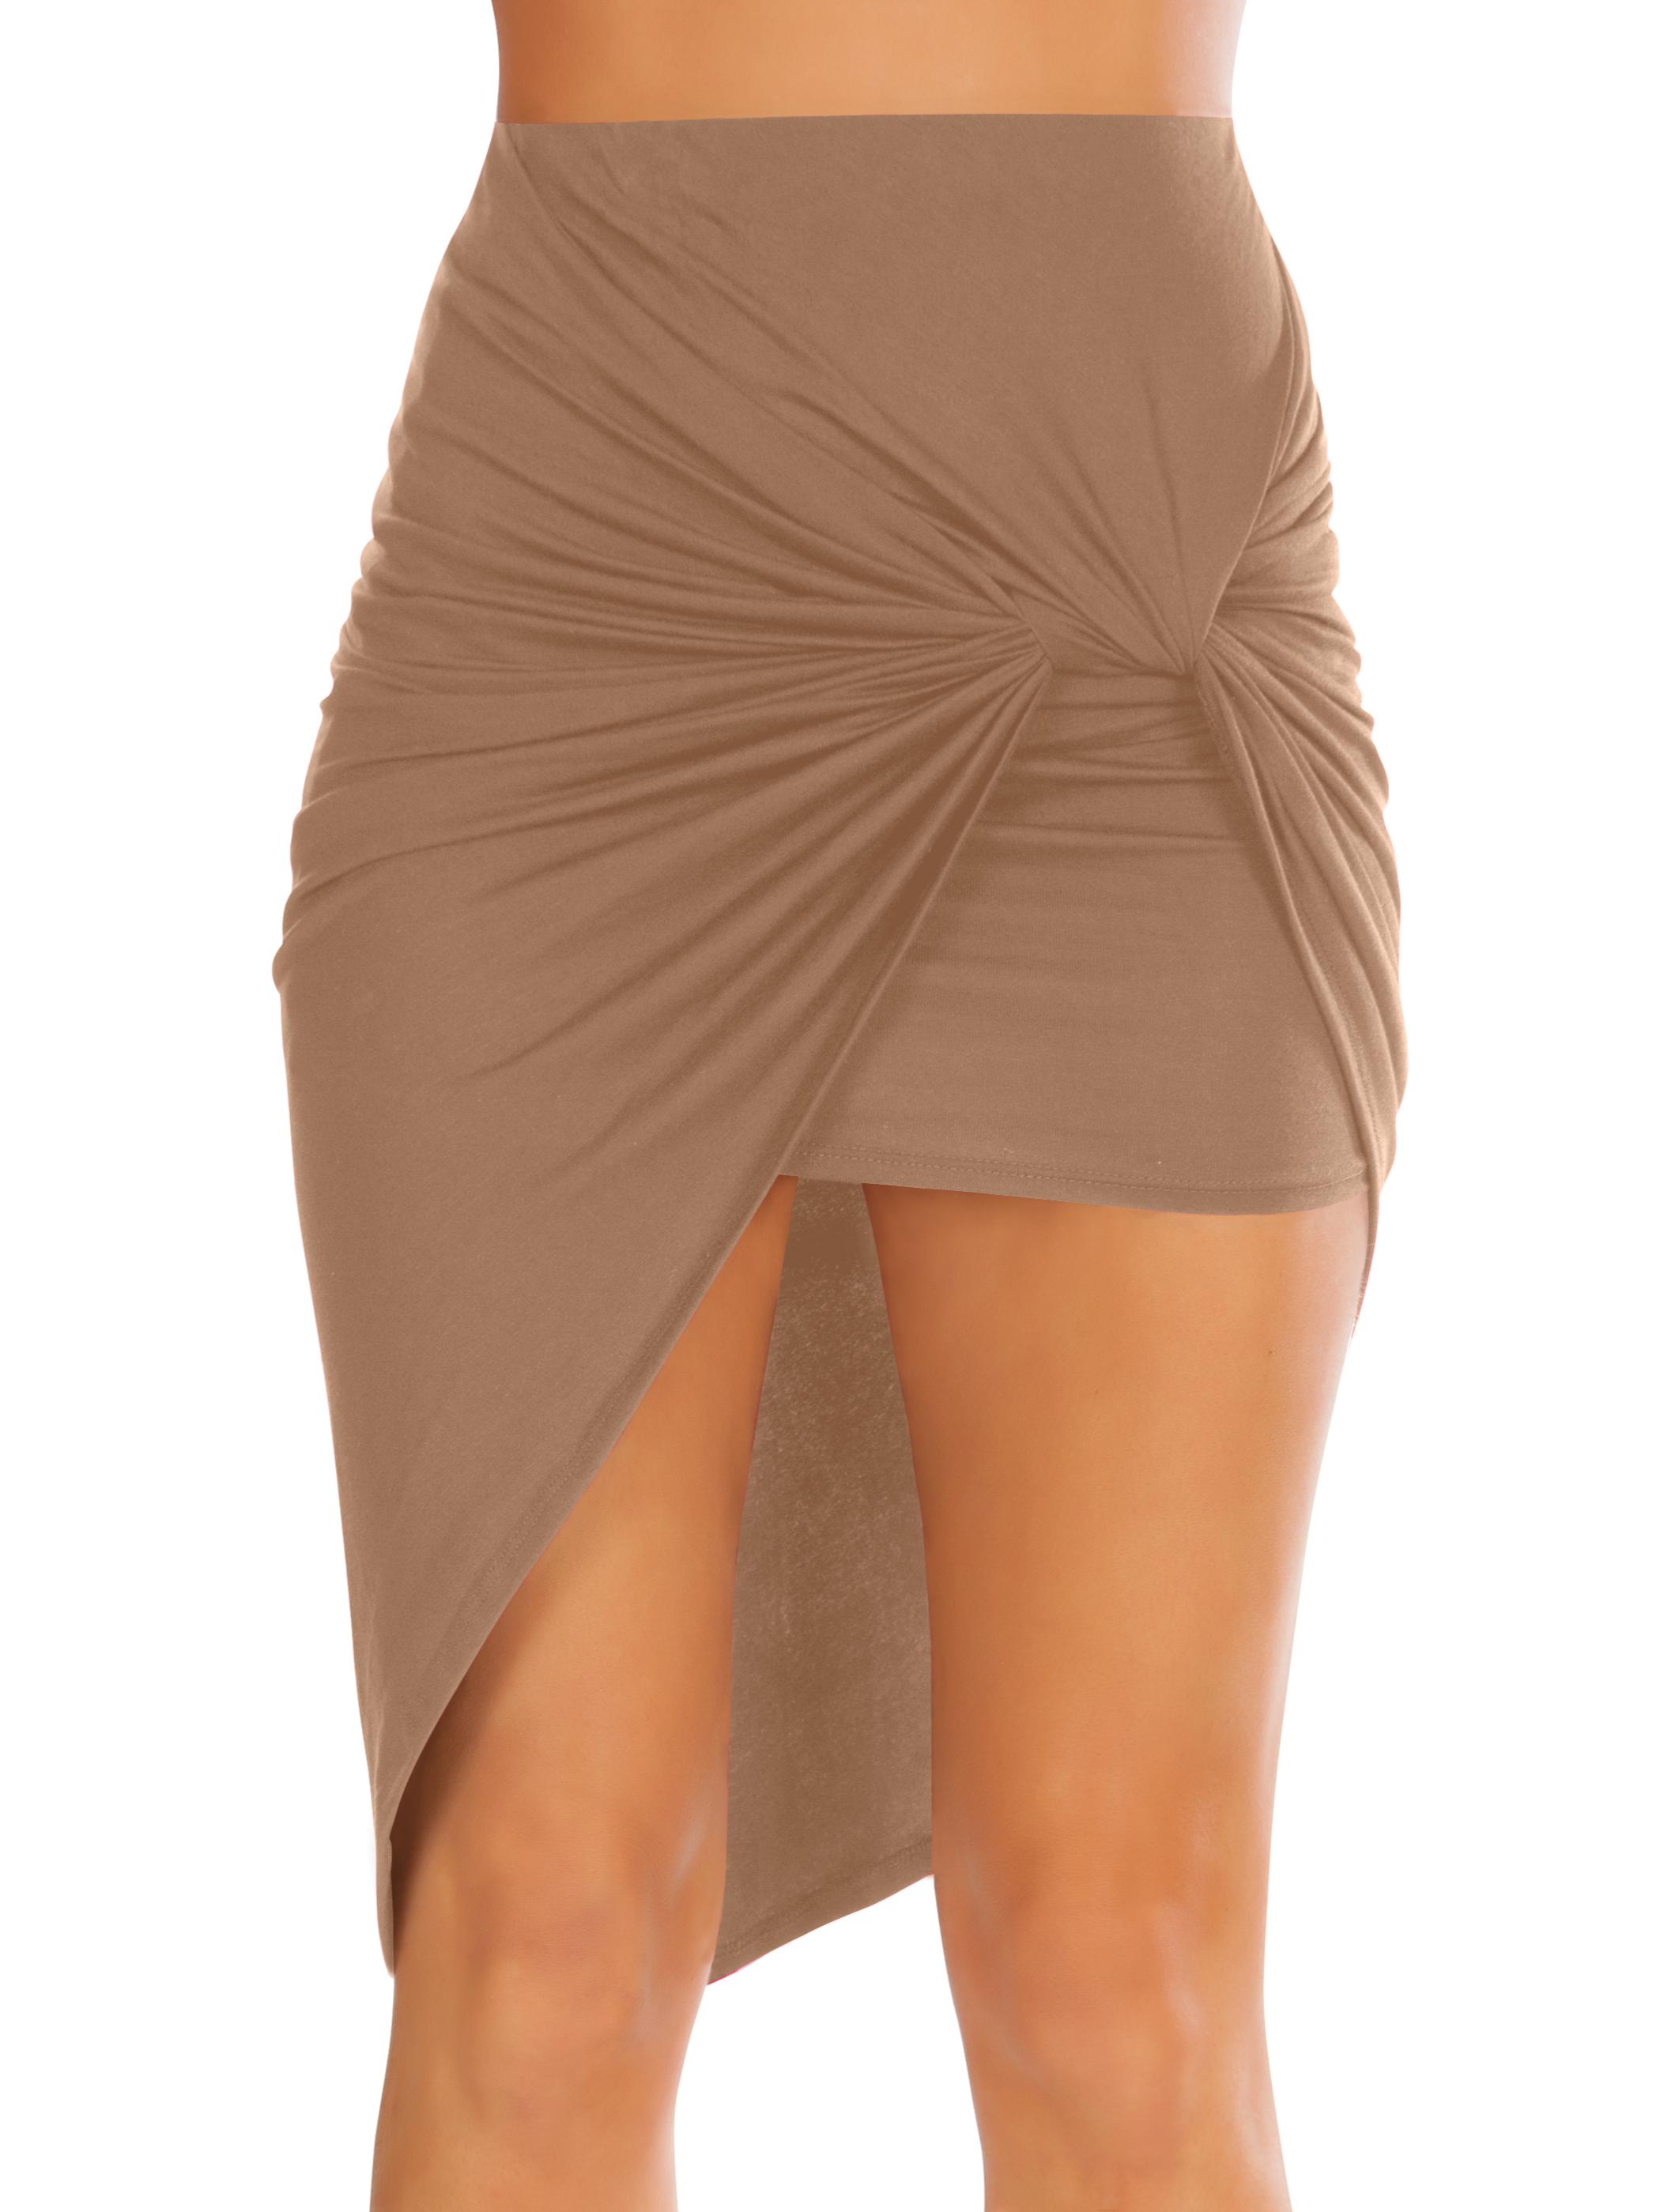 Size Small, Mocha Womens Drape Up Stretchy Asymmetrical High Low Short Mini Bodycon Pencil Skirt